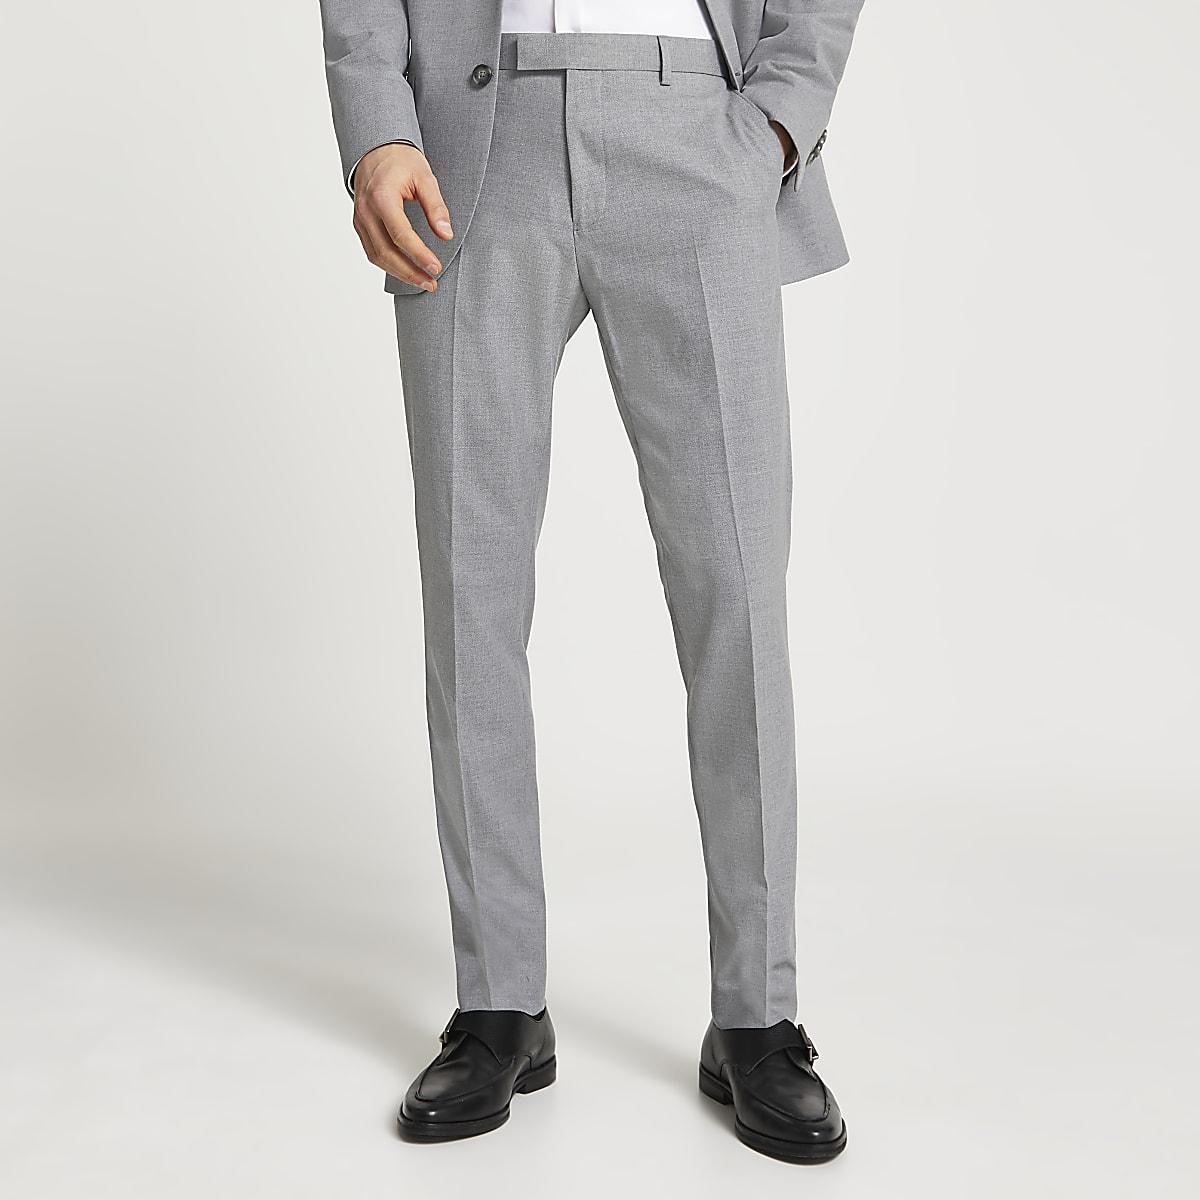 Grijze slim-fit pantalon met textuur